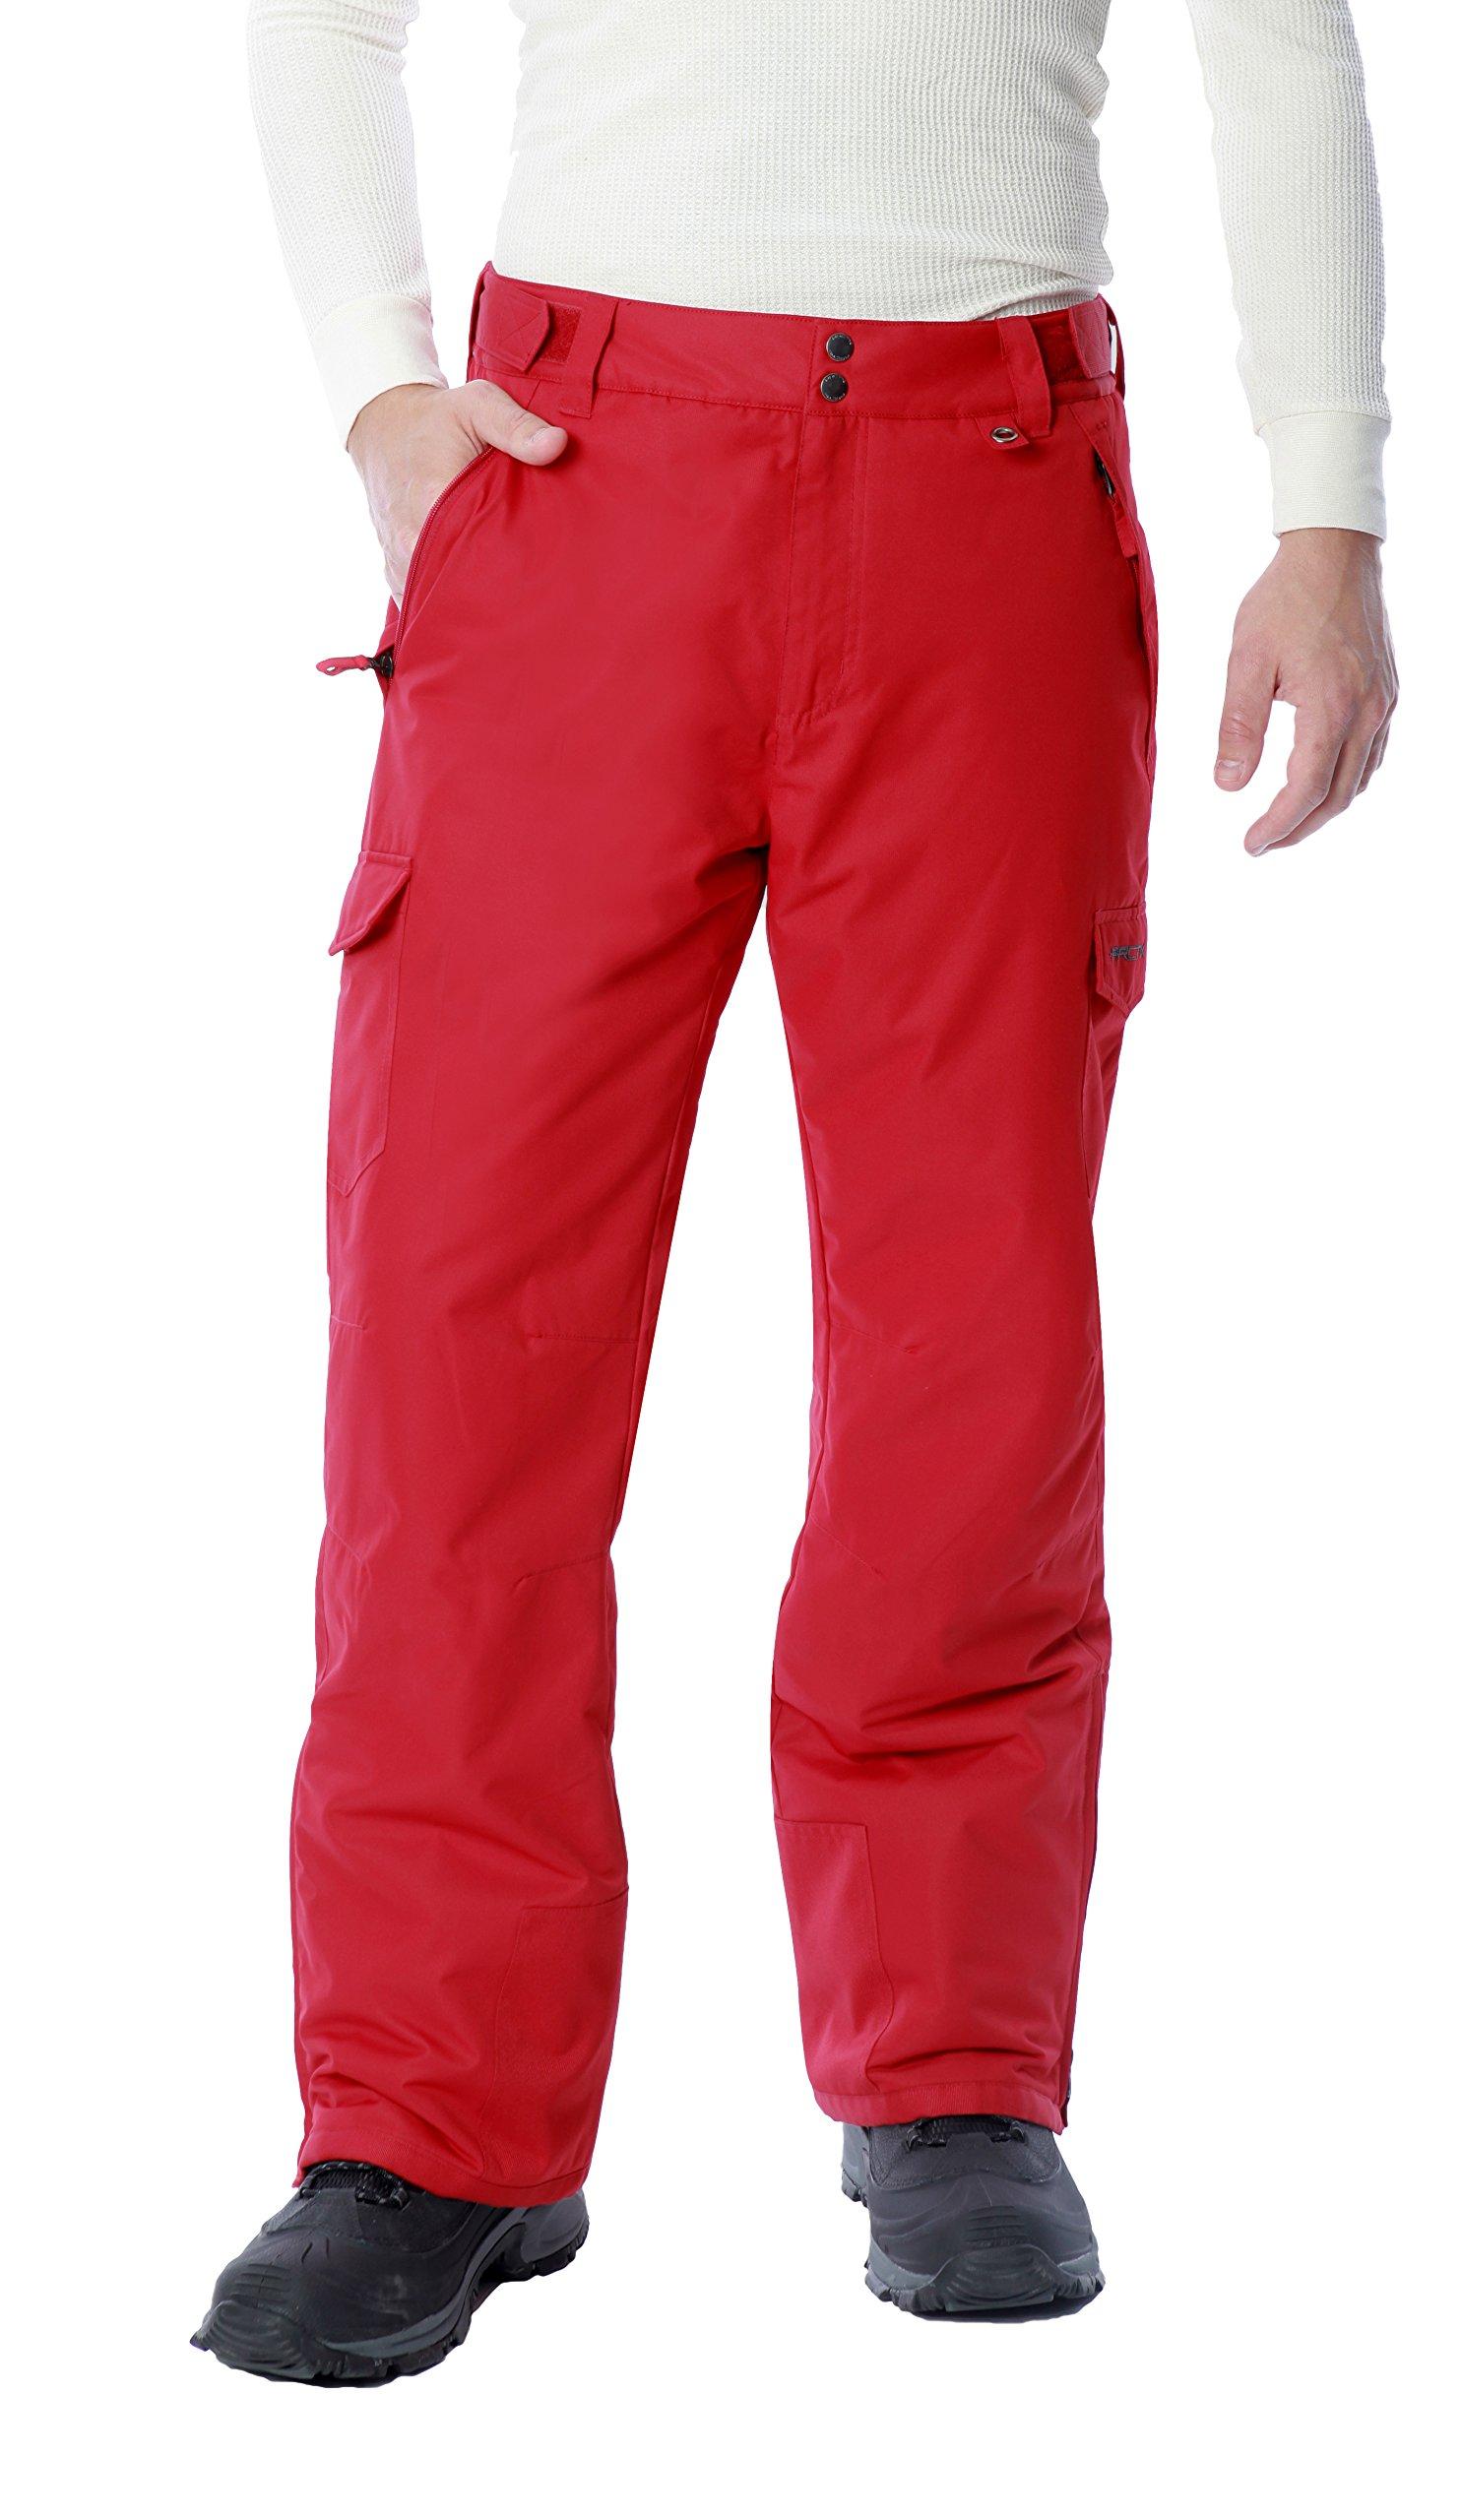 Arctix Men's 1960 Snow Sports Cargo Pants, Small, Vintage Red